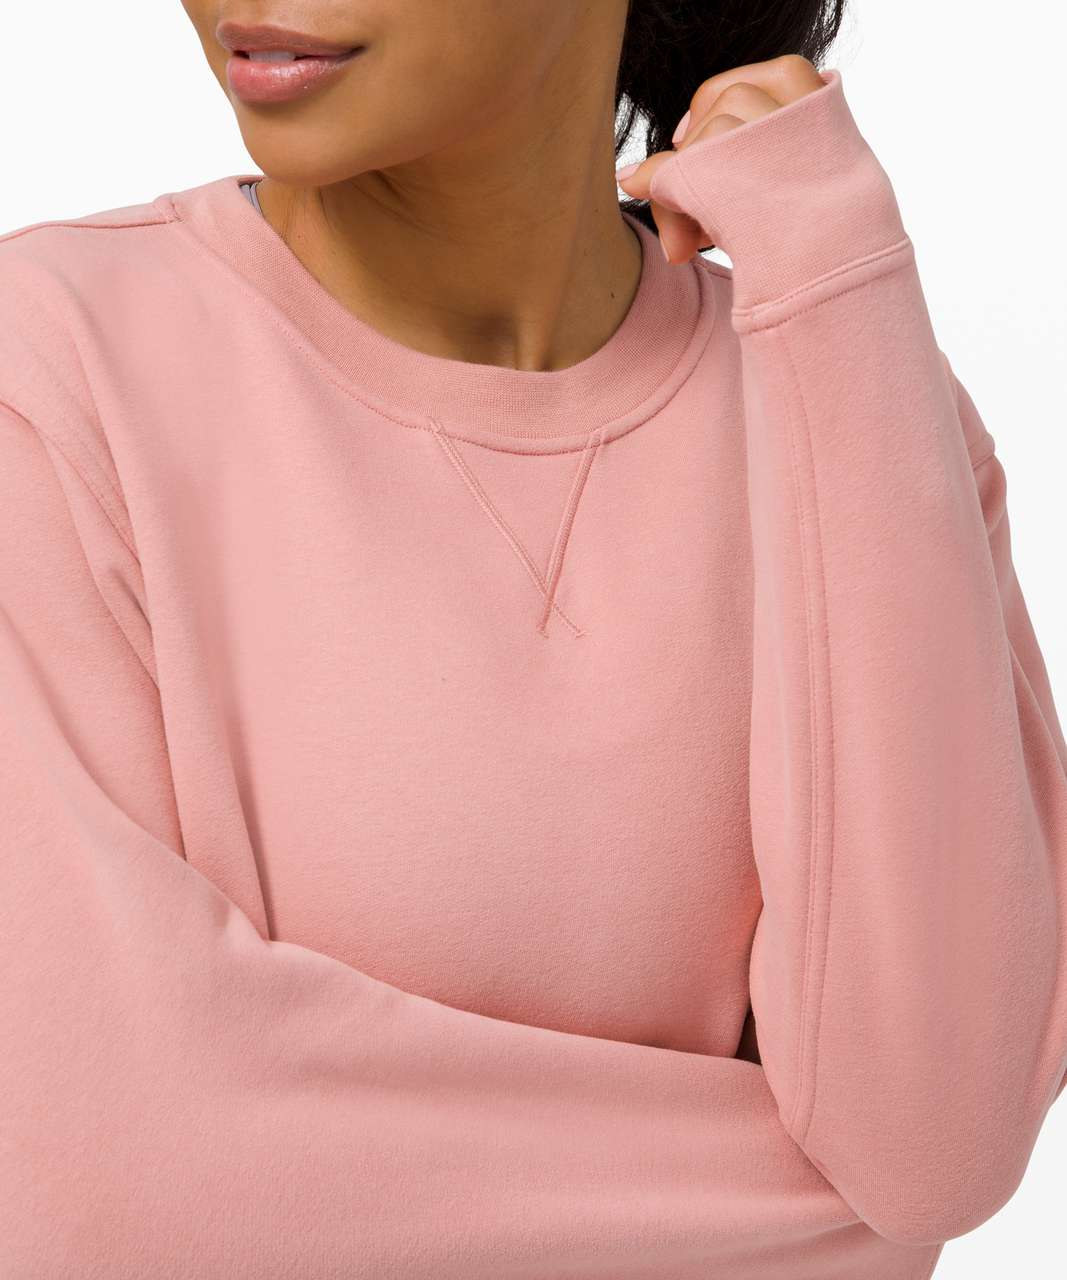 Lululemon All Yours Crew *Fleece - Pink Pastel